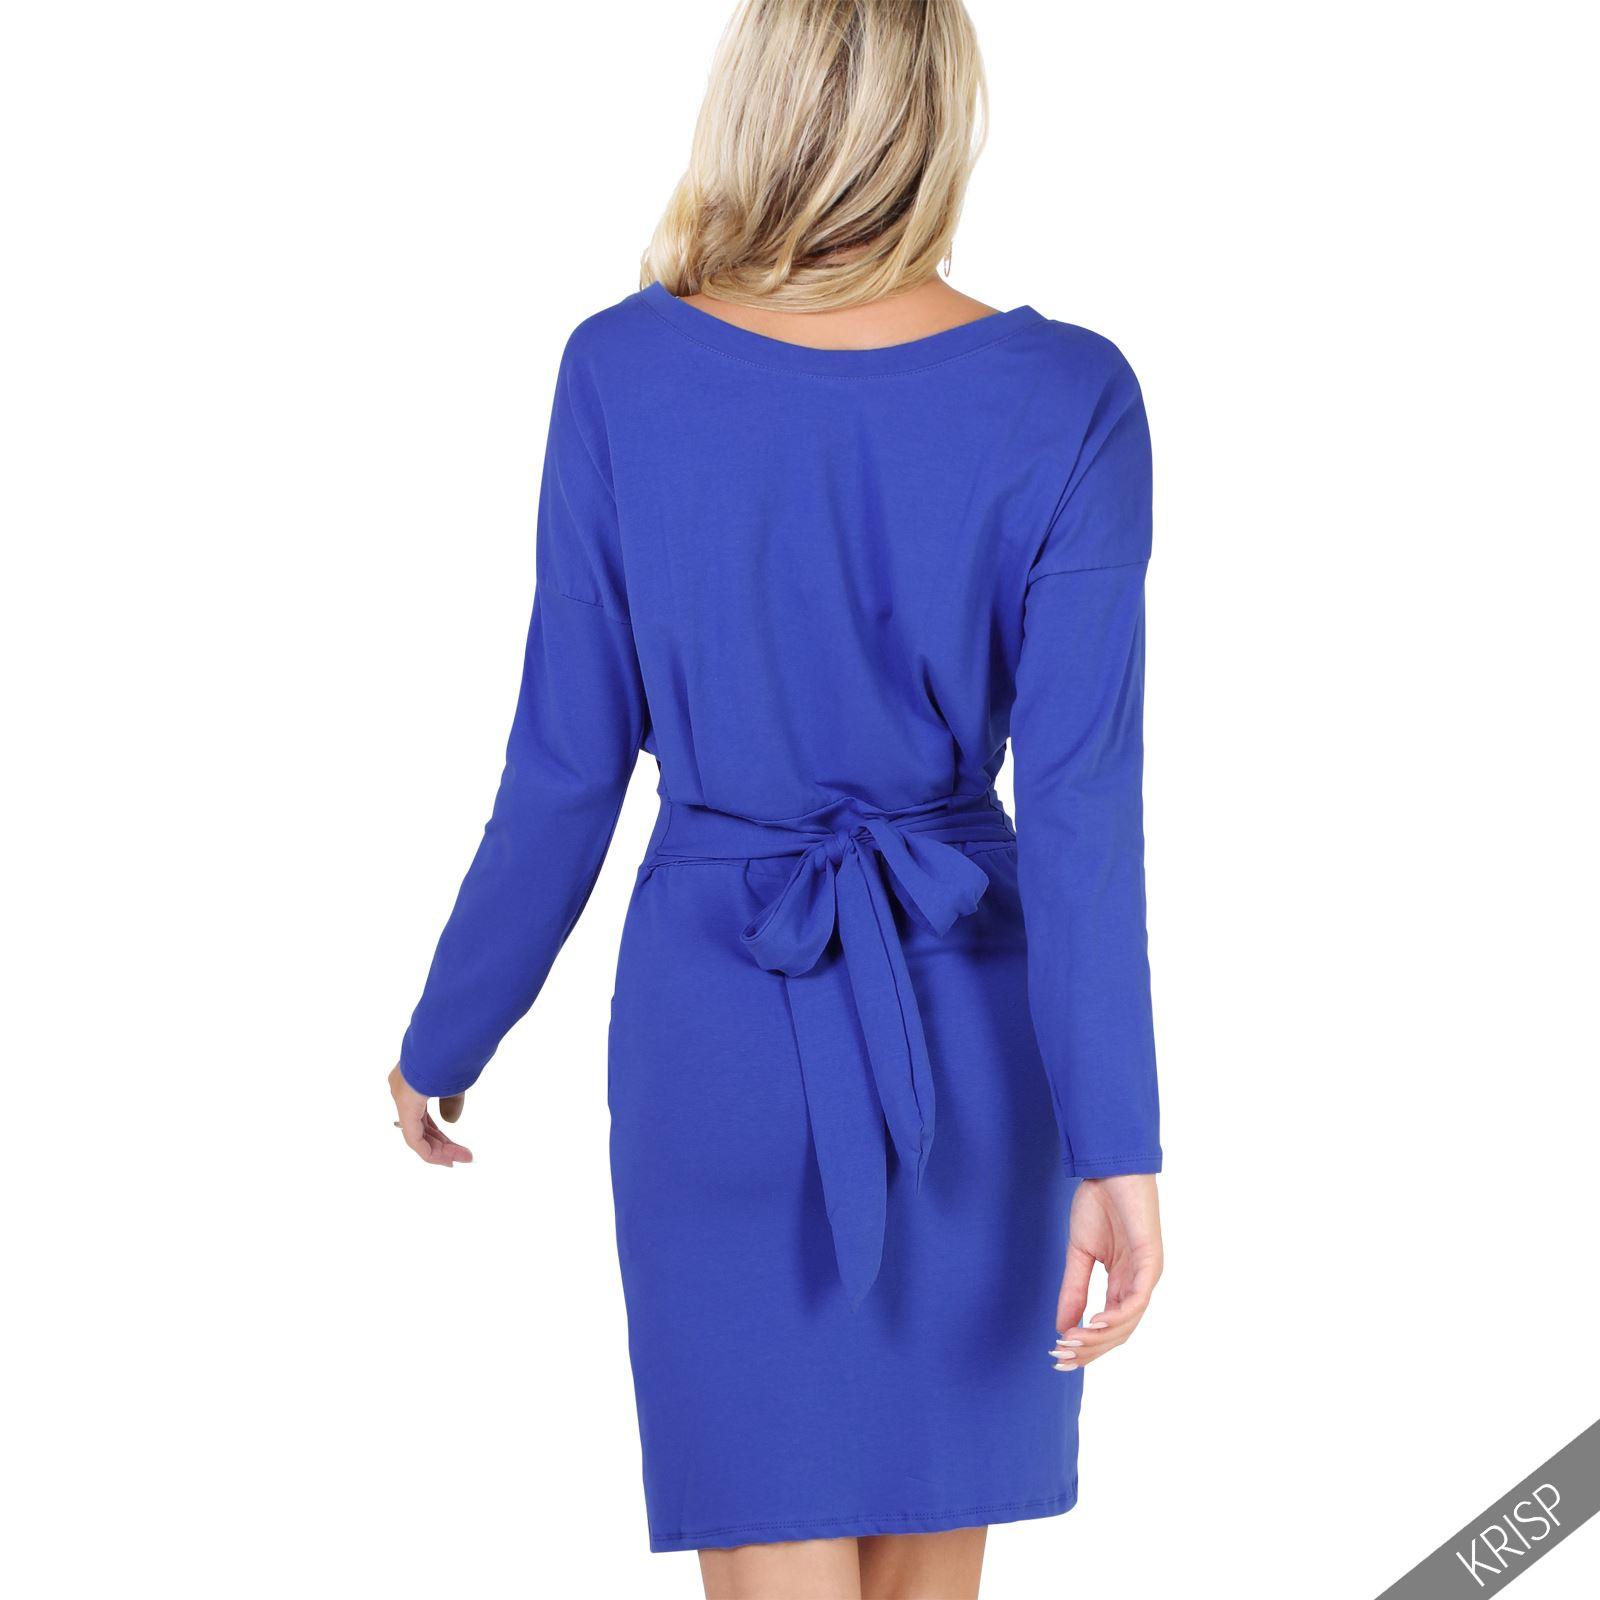 Cool Sports Dresses Football Player Costume Women S Mini Dresses Jersey